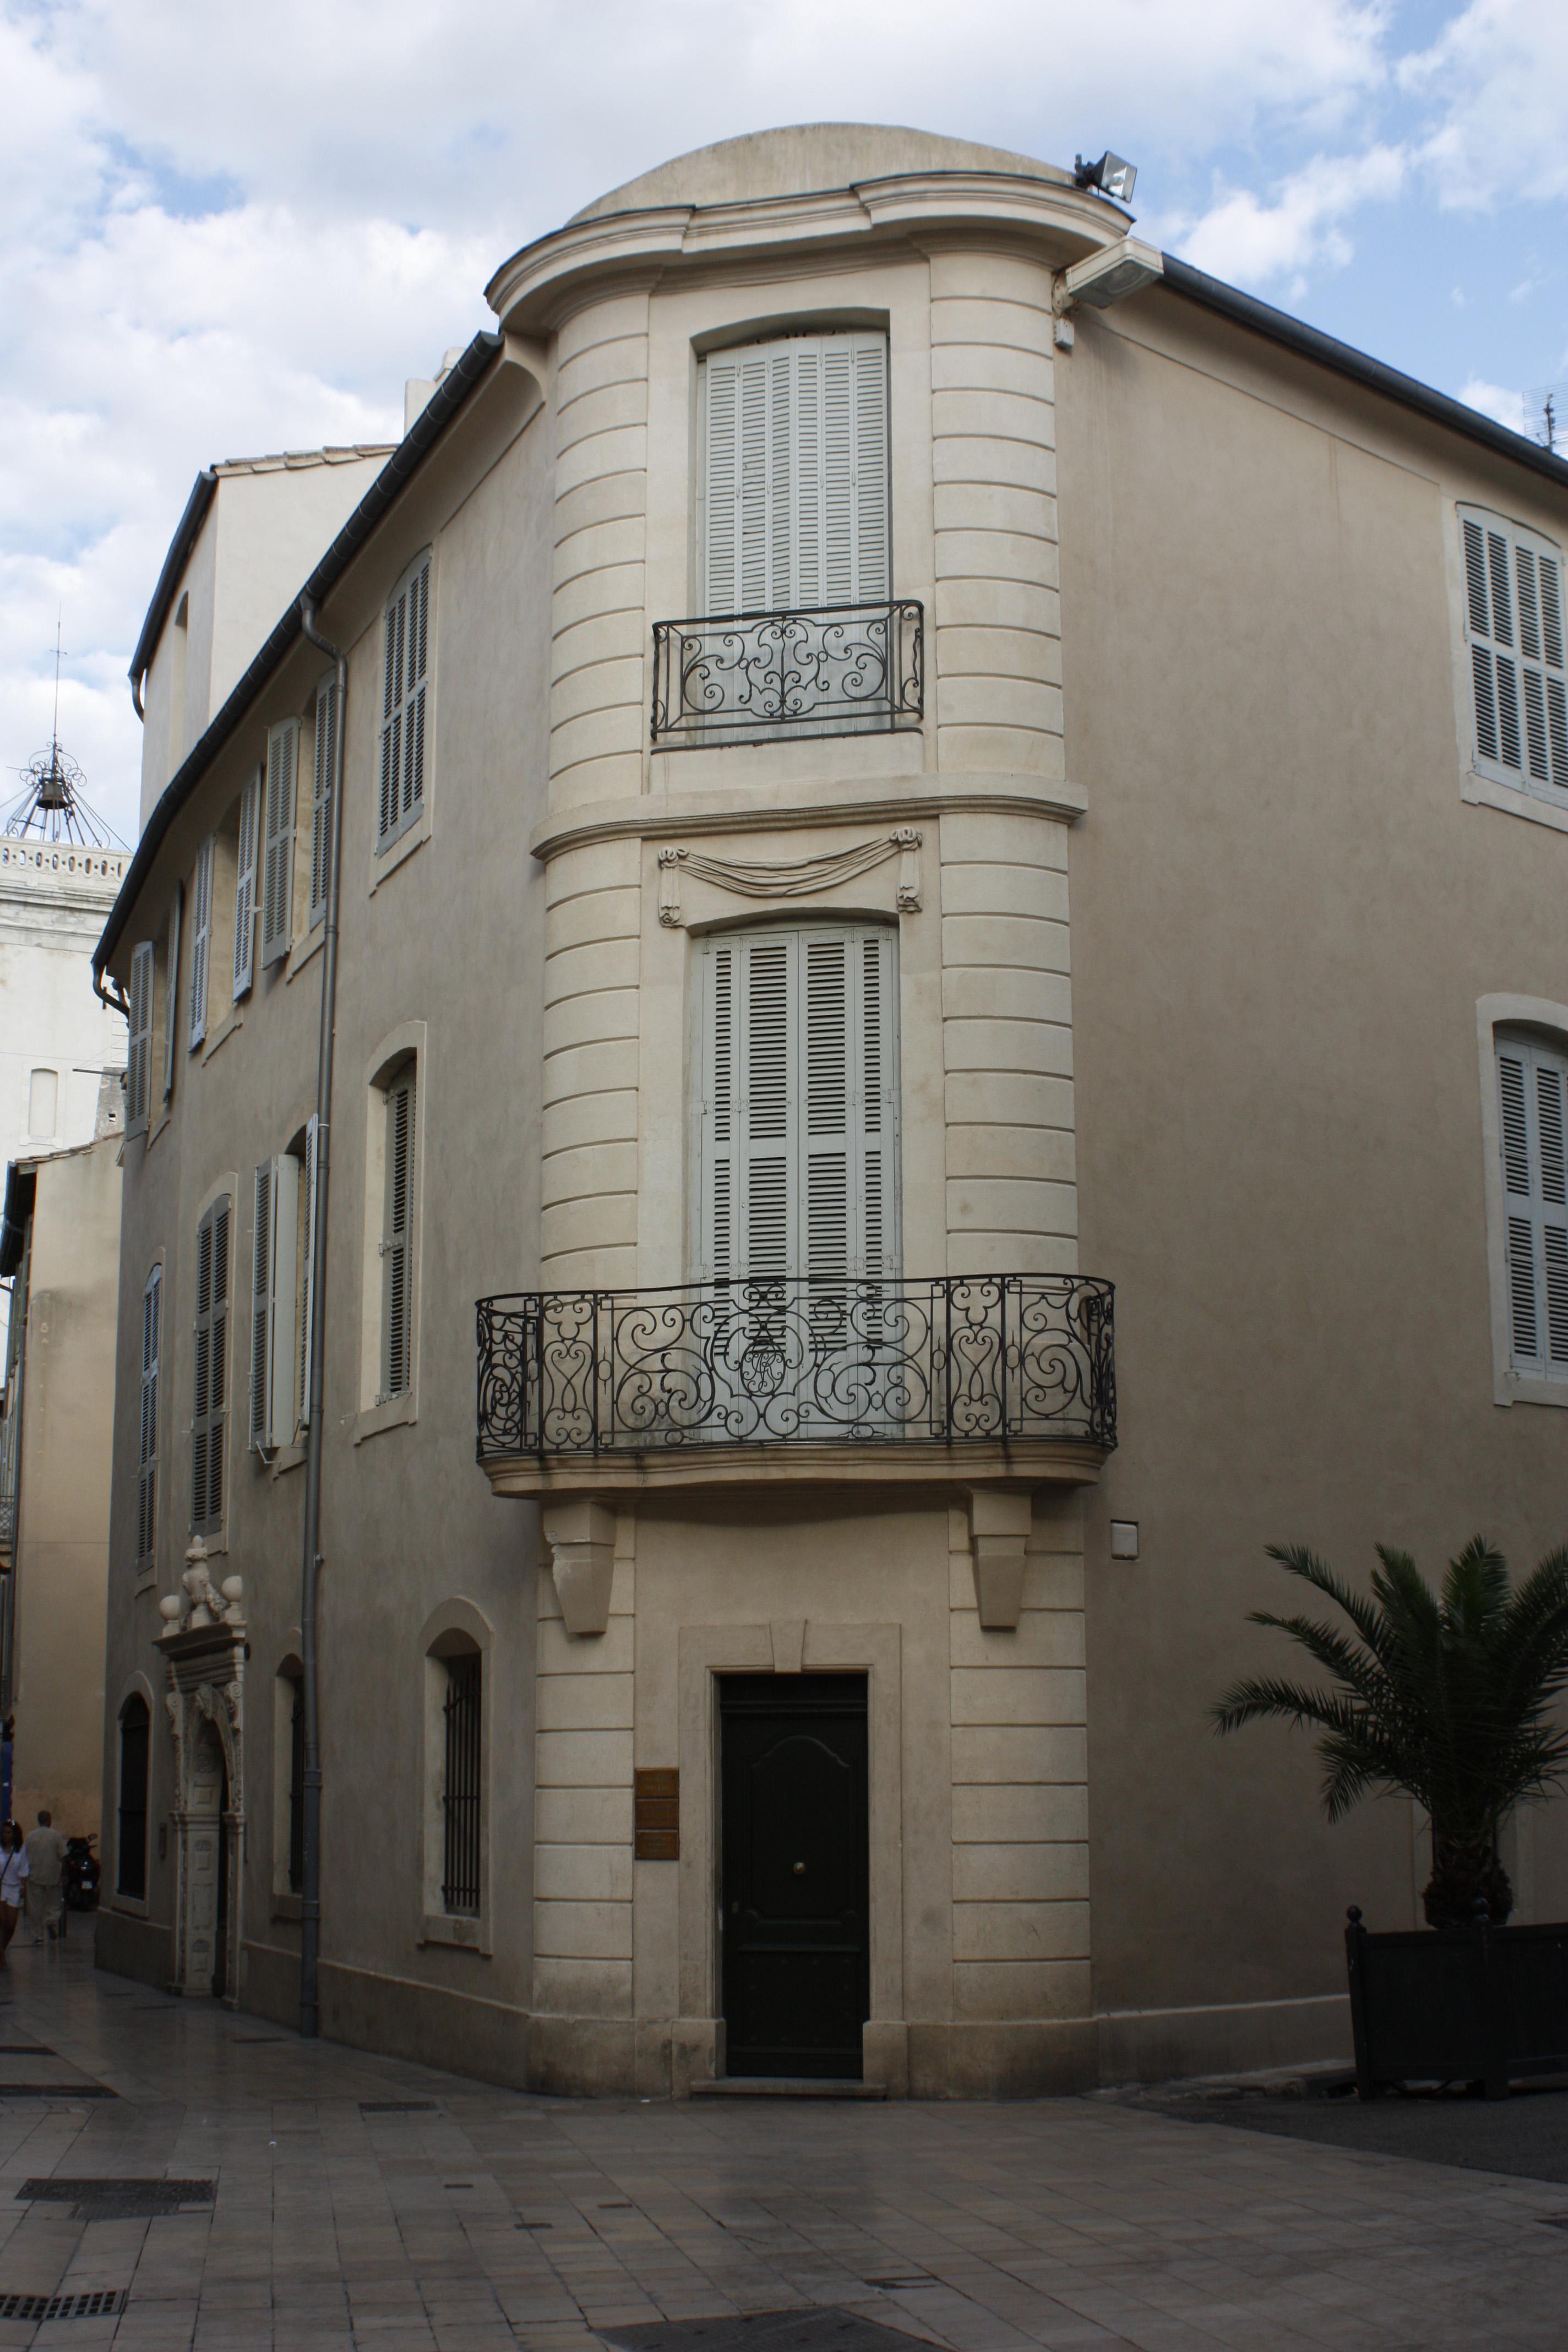 FileNîmesHôtel BesseriéBalcons en fer forgéjpg  Wikimedia Commons -> Pose Télé En Fer Forgé